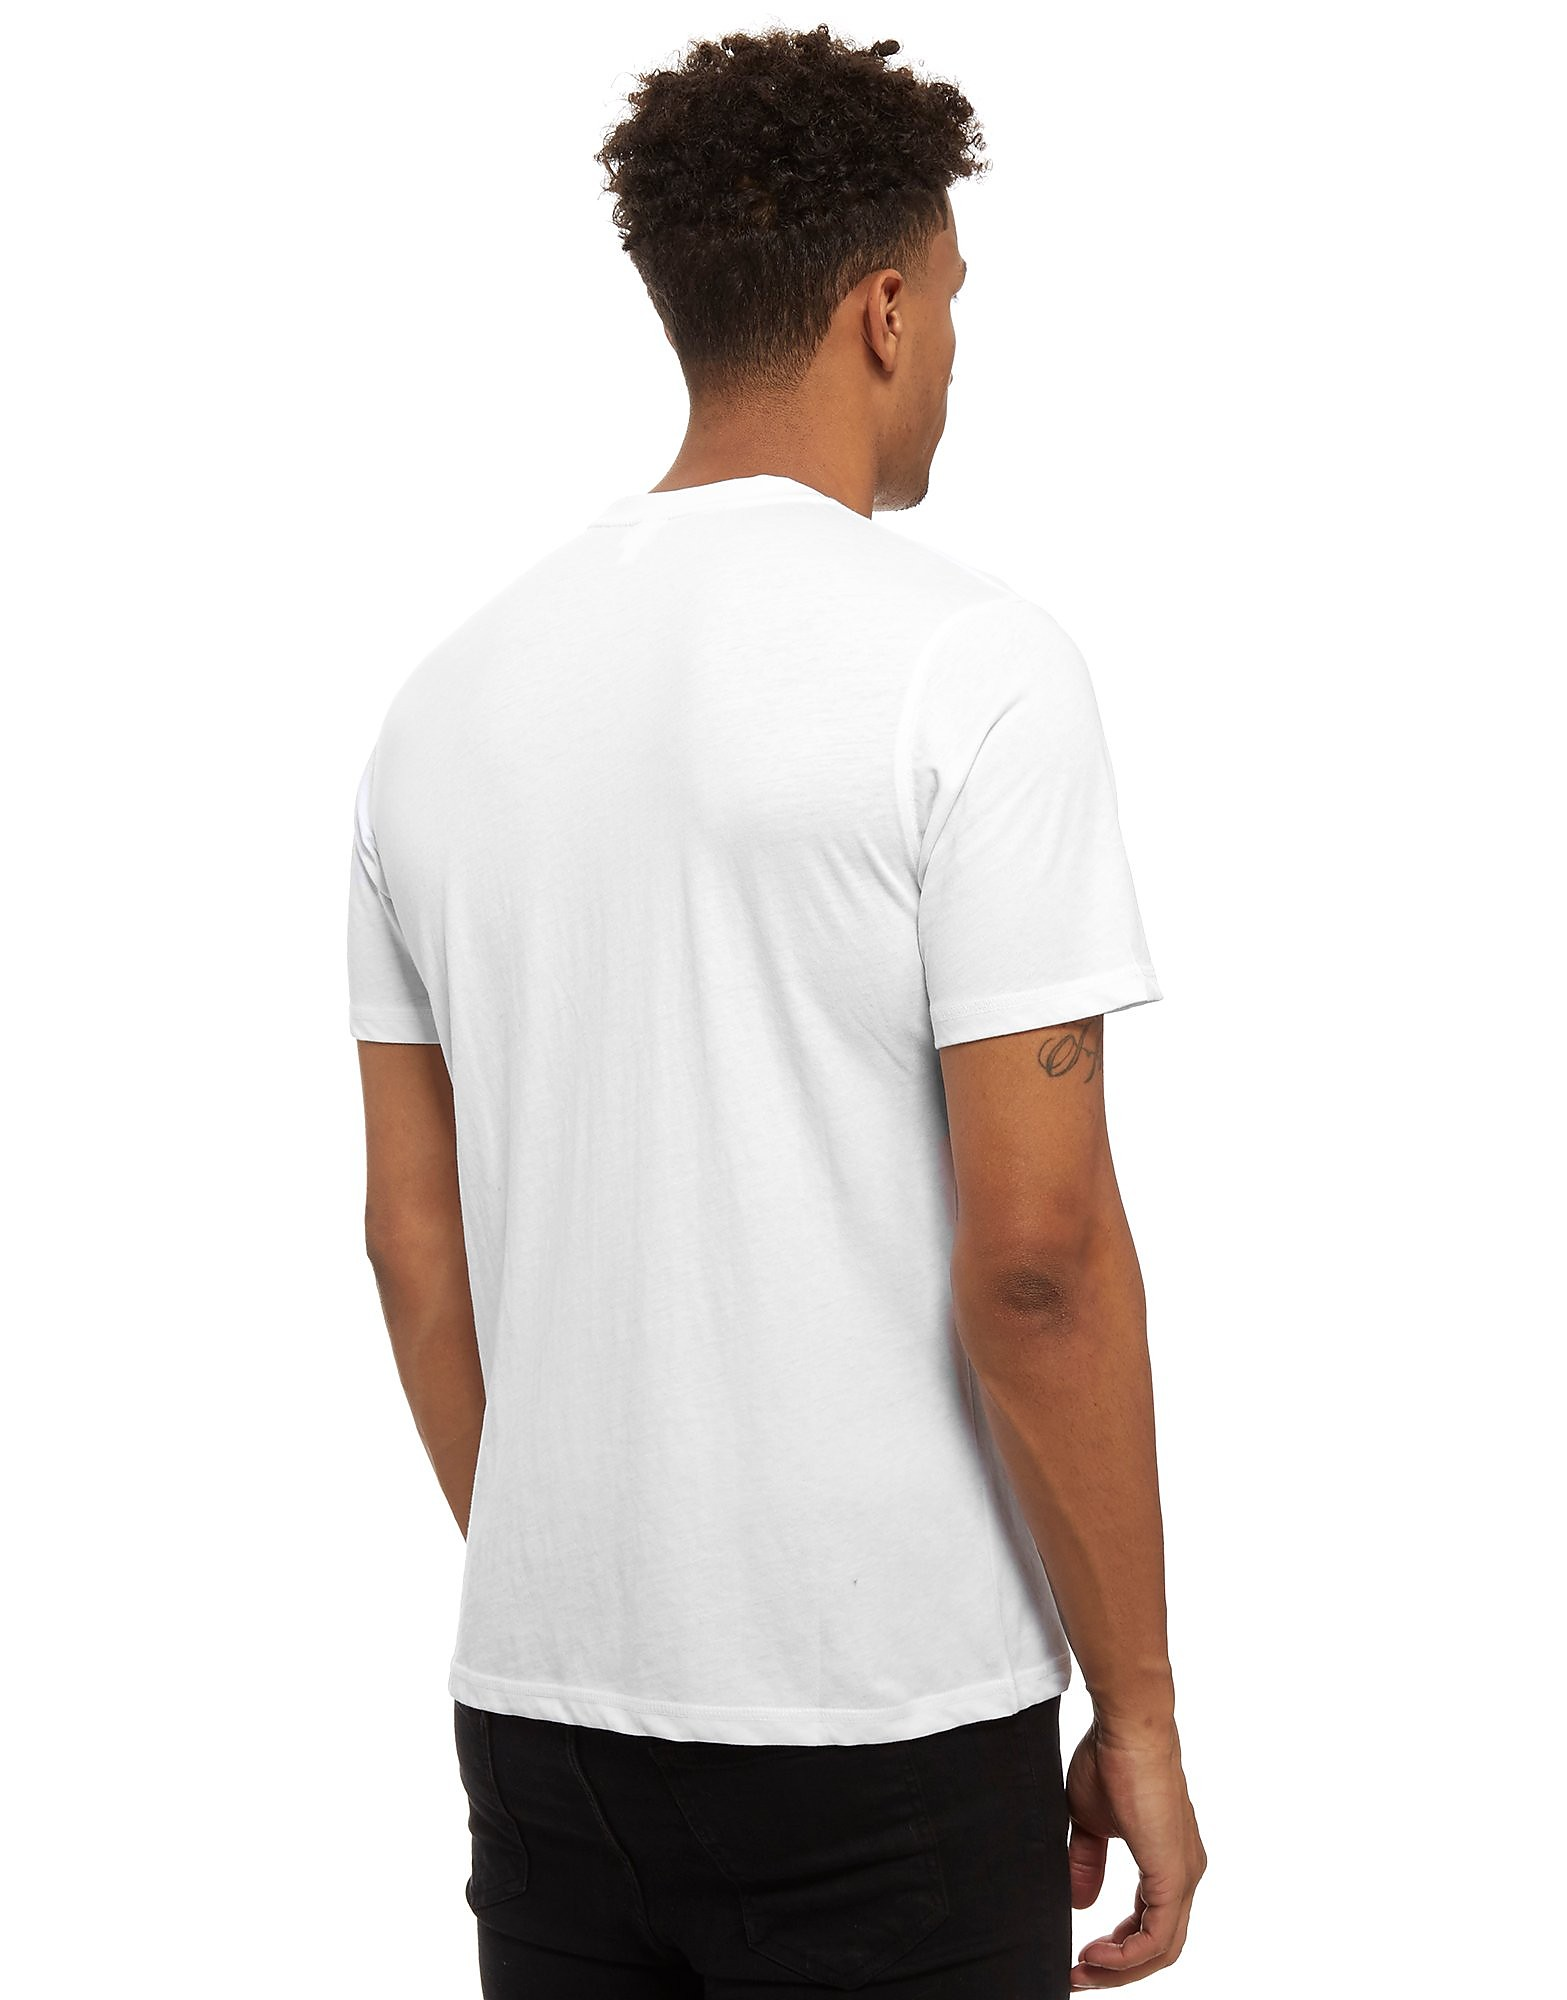 Sergio Tacchini Elbow T-Shirt